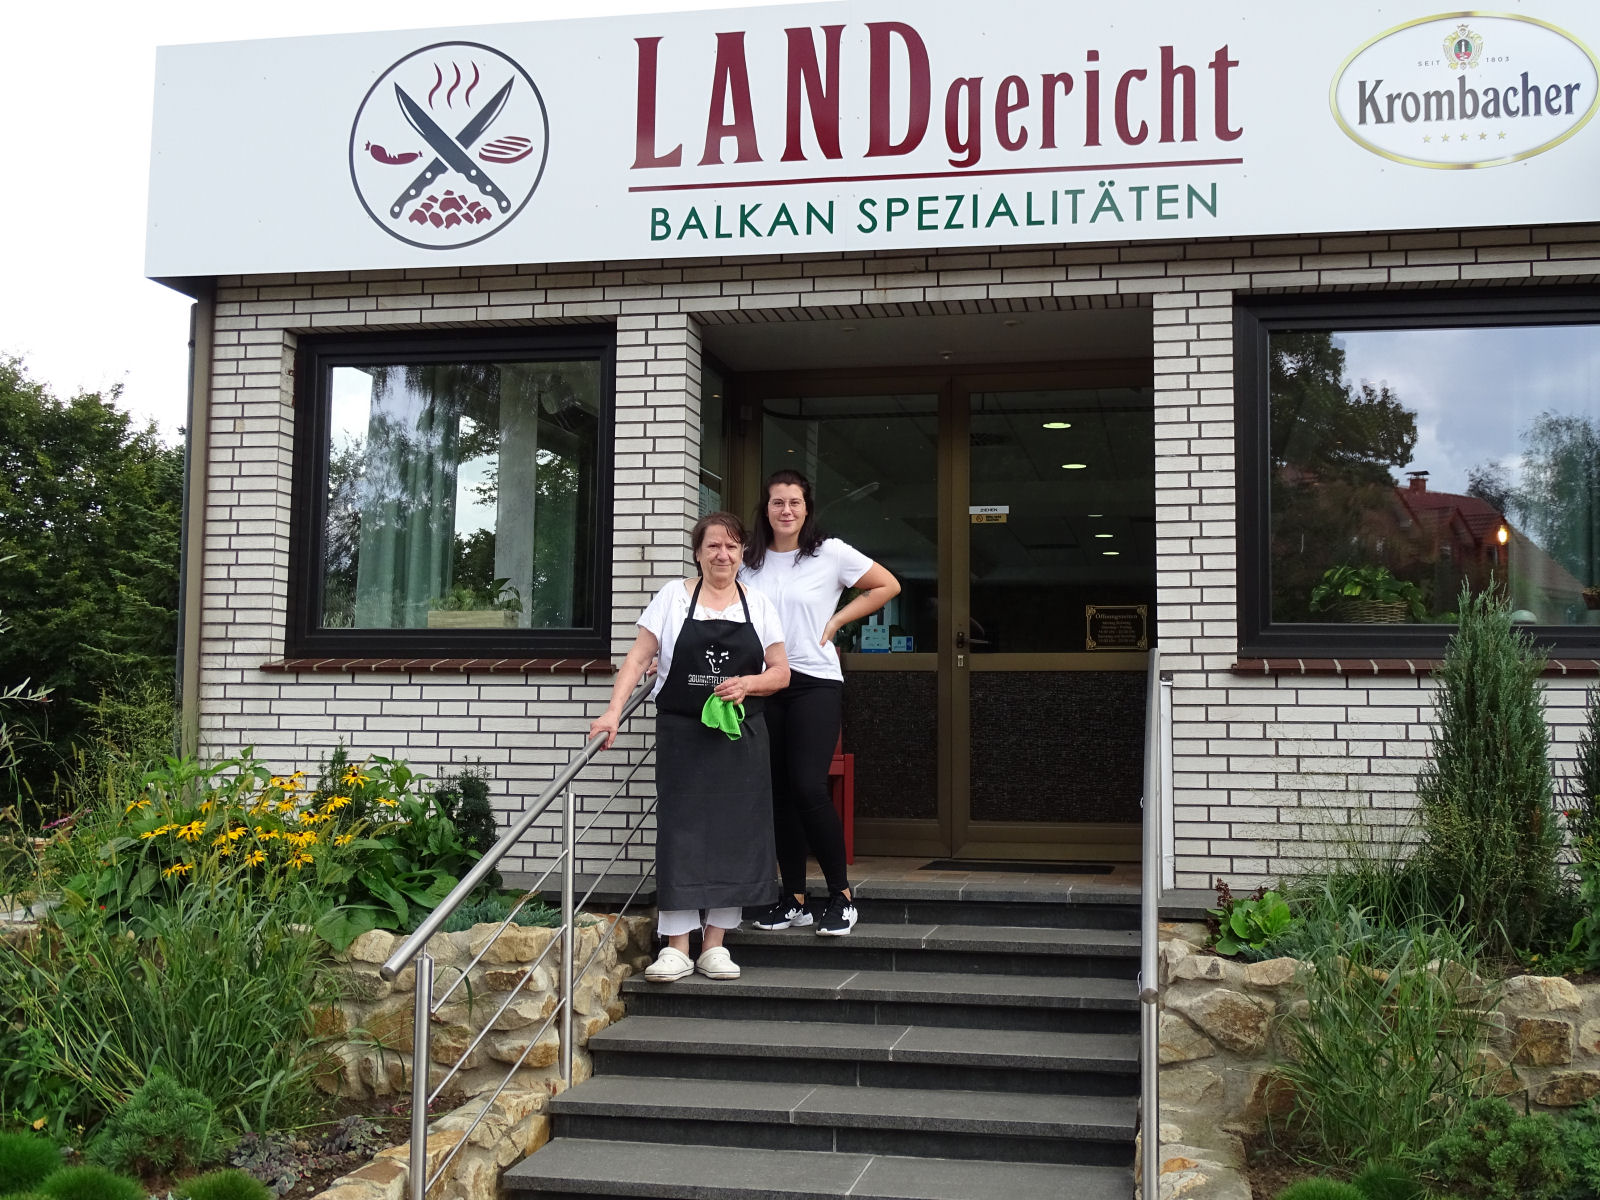 Landgericht Lembeck, Bojenna Dedivanovic, Jaqueline Dedivanovic